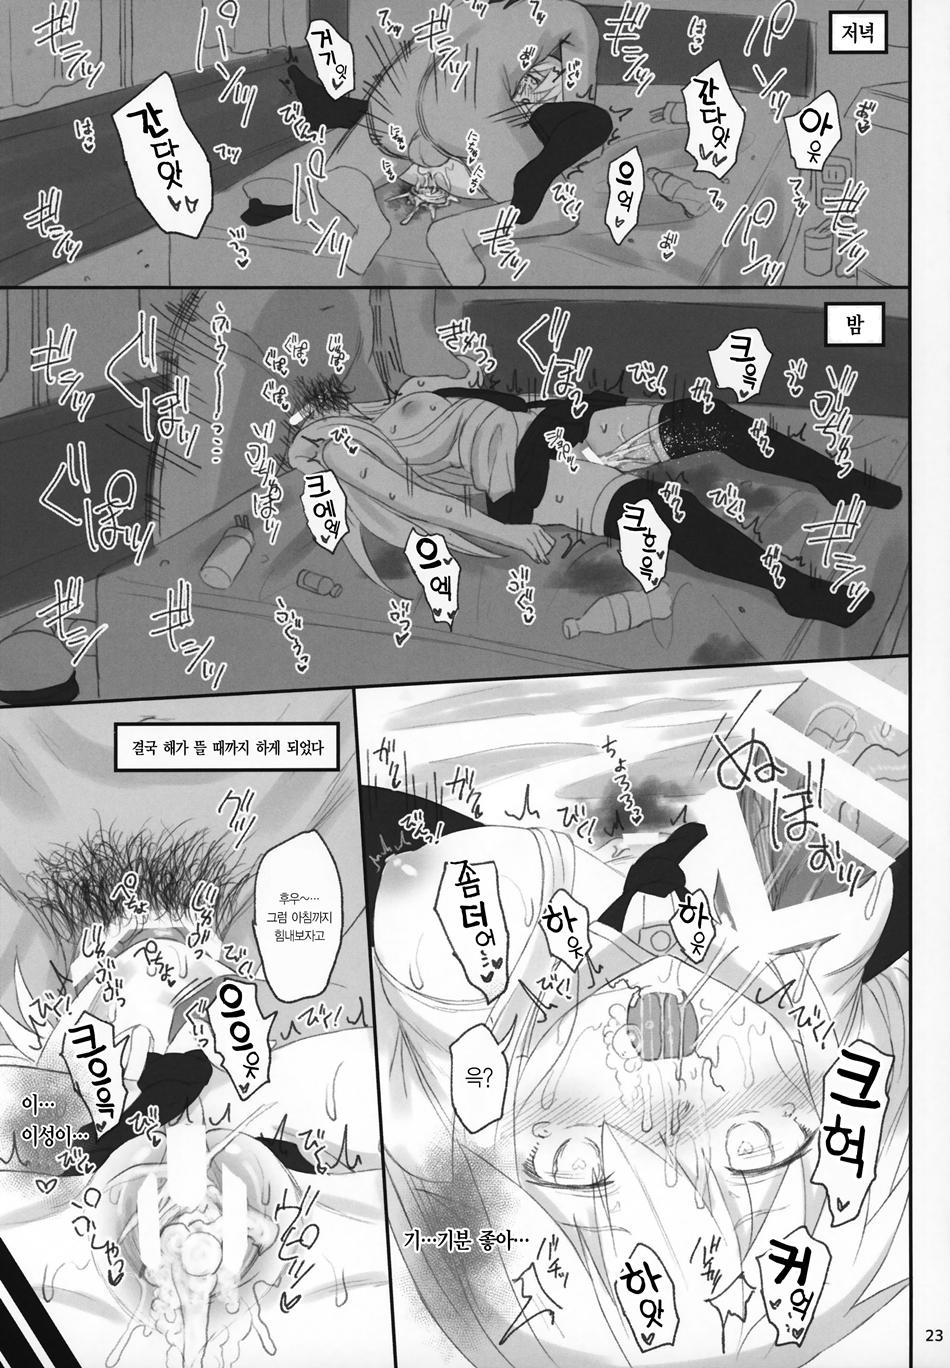 c97_hammer_head_makabe_gorou_enterprise_no_keibo_azur_lane_022.jpg